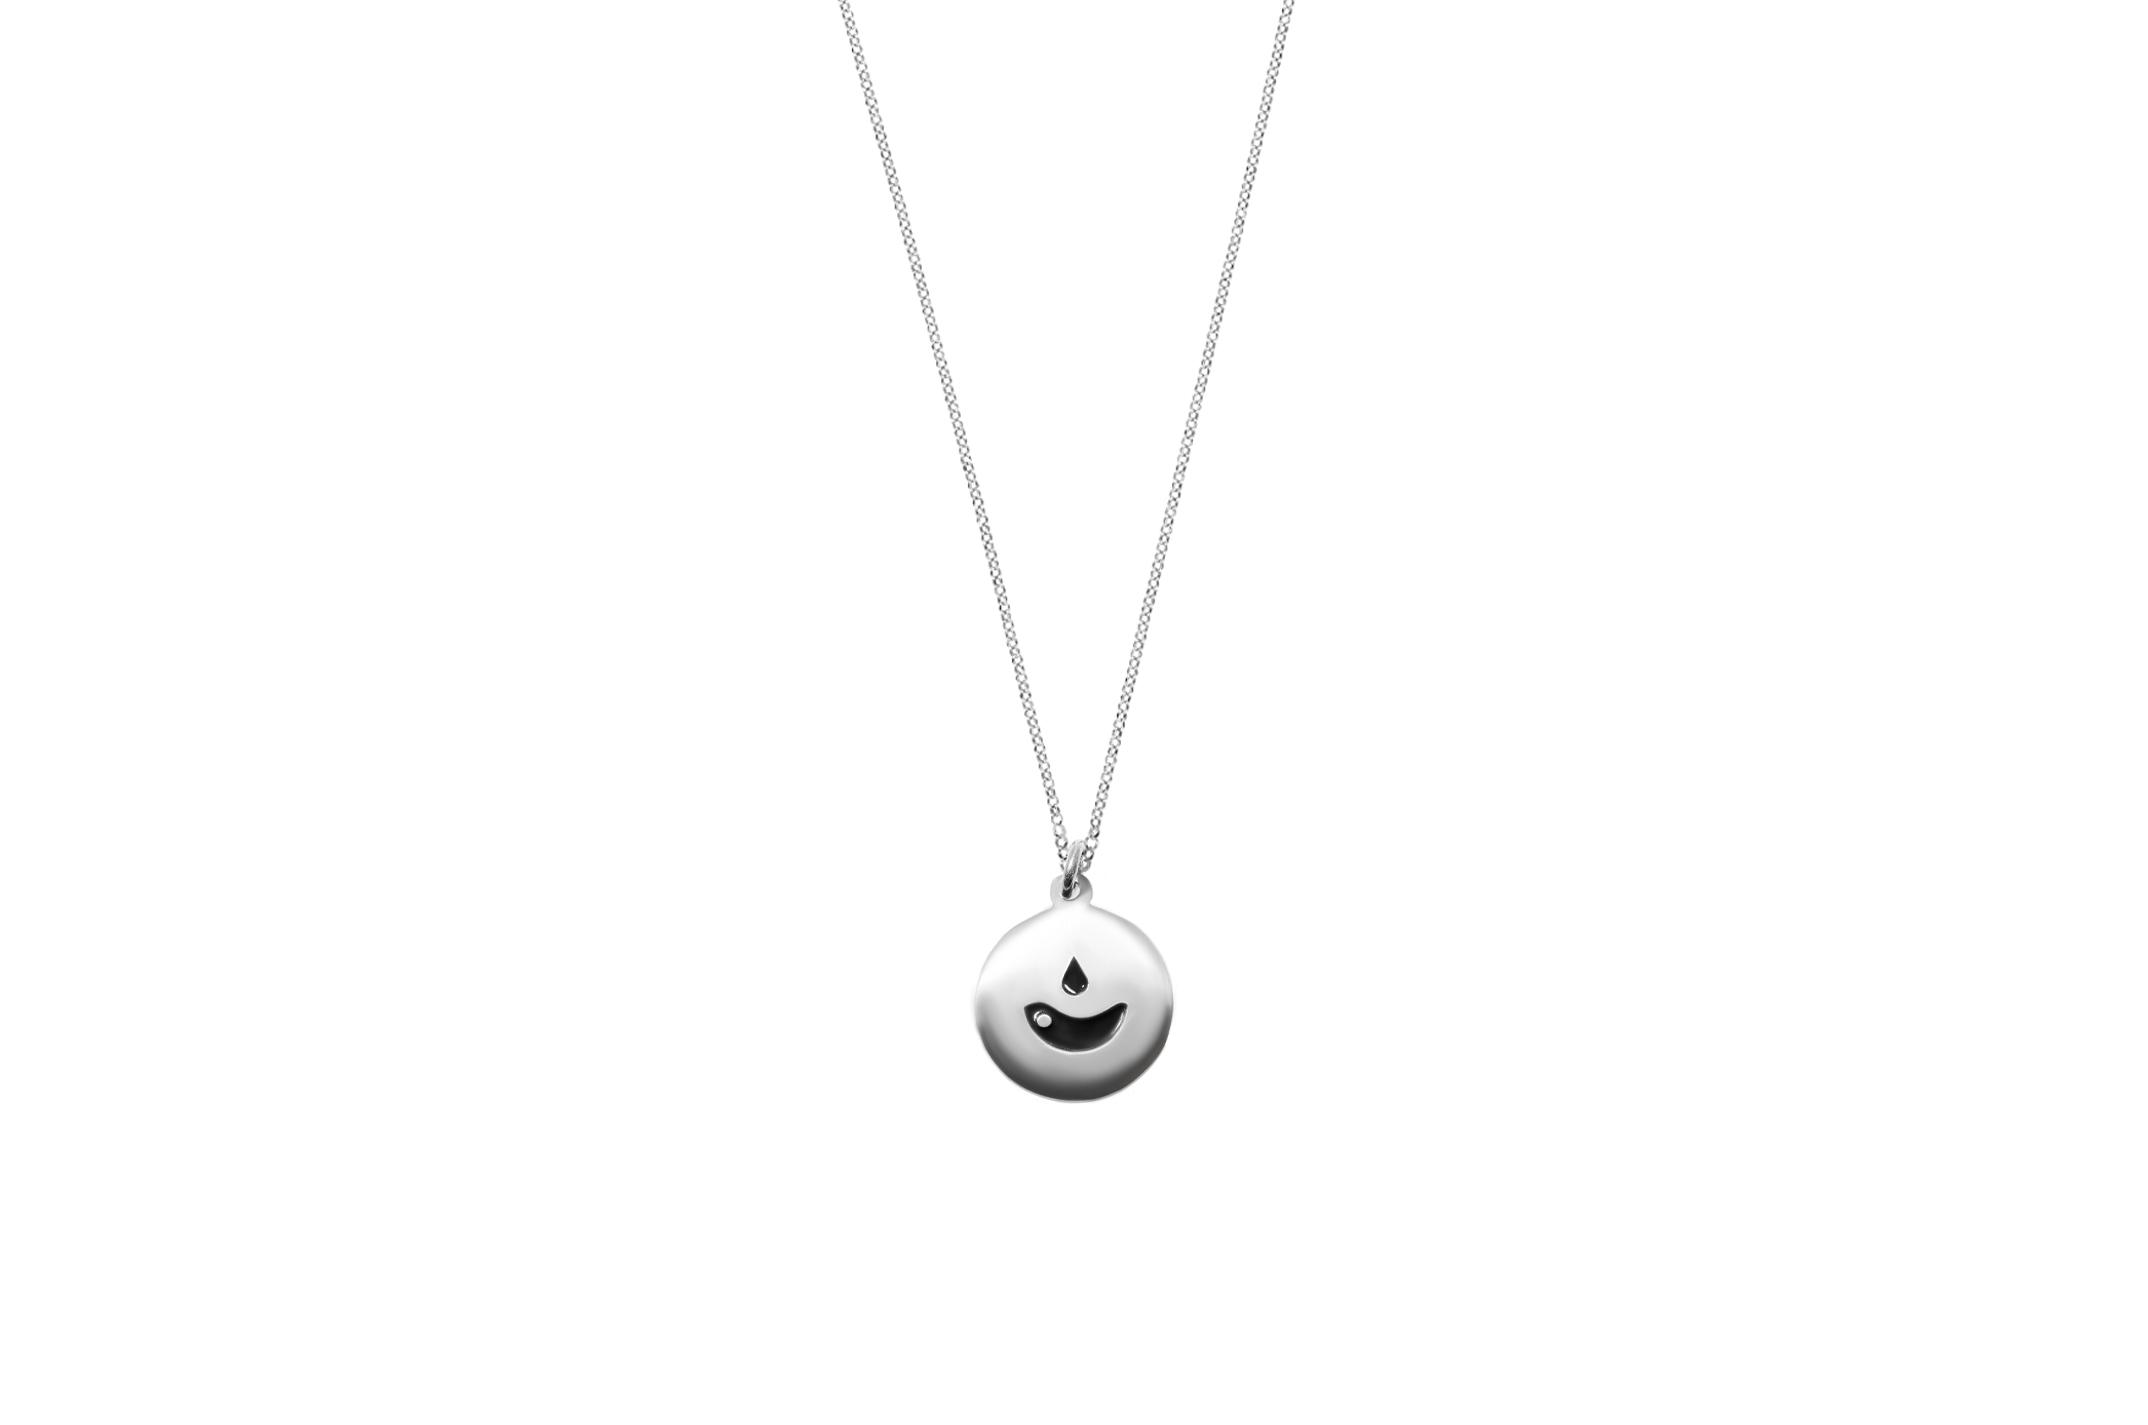 Joia: colar;Material: prata 925;Cor: branco;Medida (Fio): 38 + 6 cm;Medida (Pendente): 1.2 cm;Género: mulher